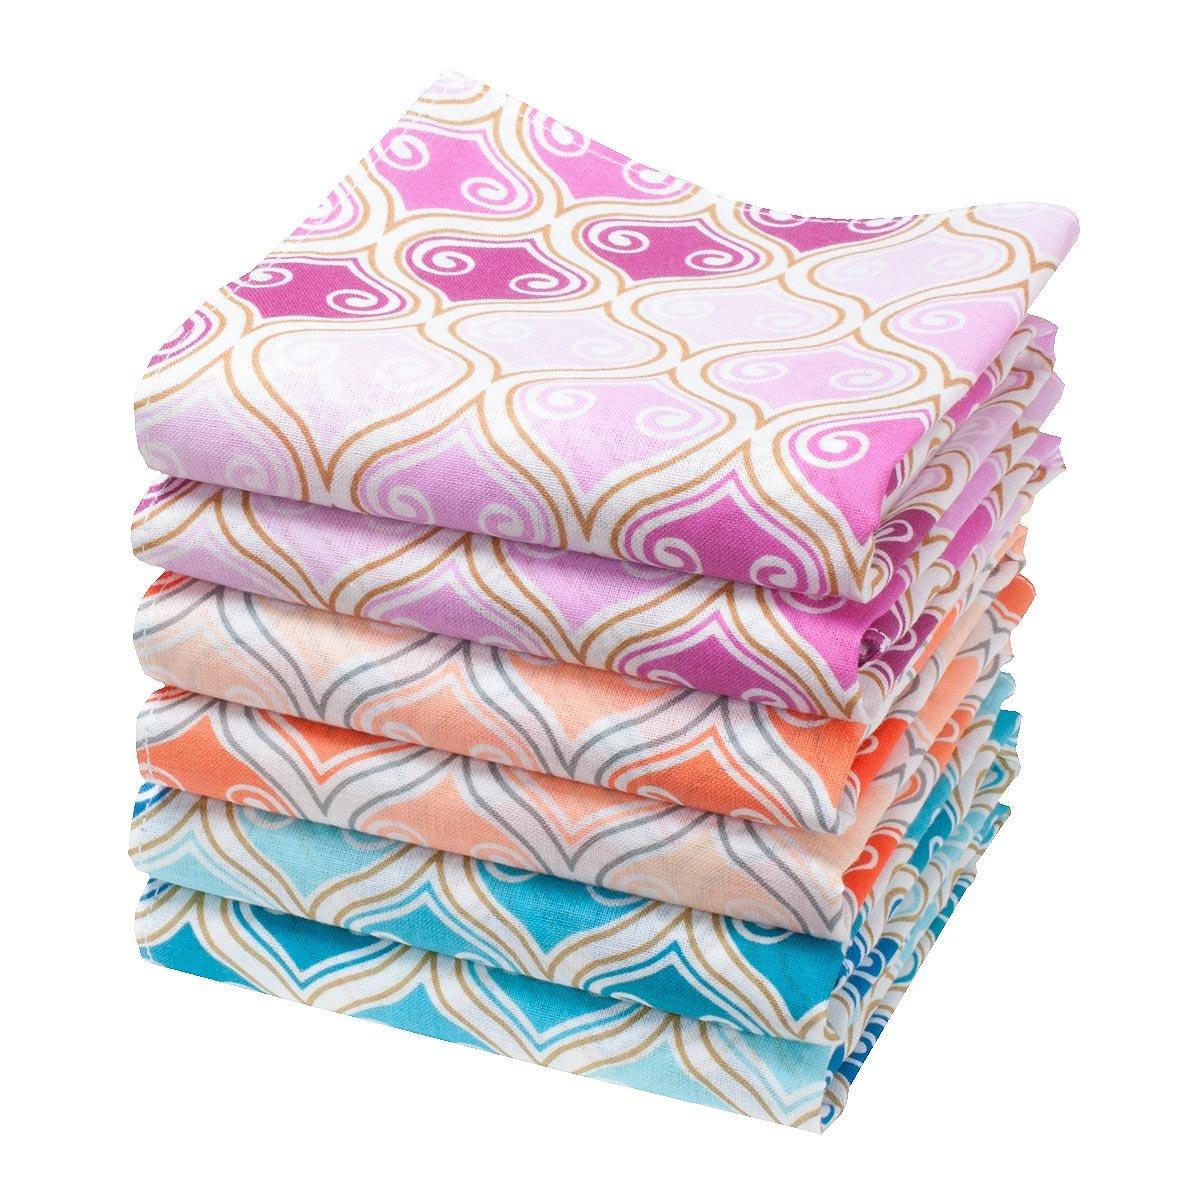 """Alphonsine"" handkerchiefs - 14"" square - 6 units Merrysquare"